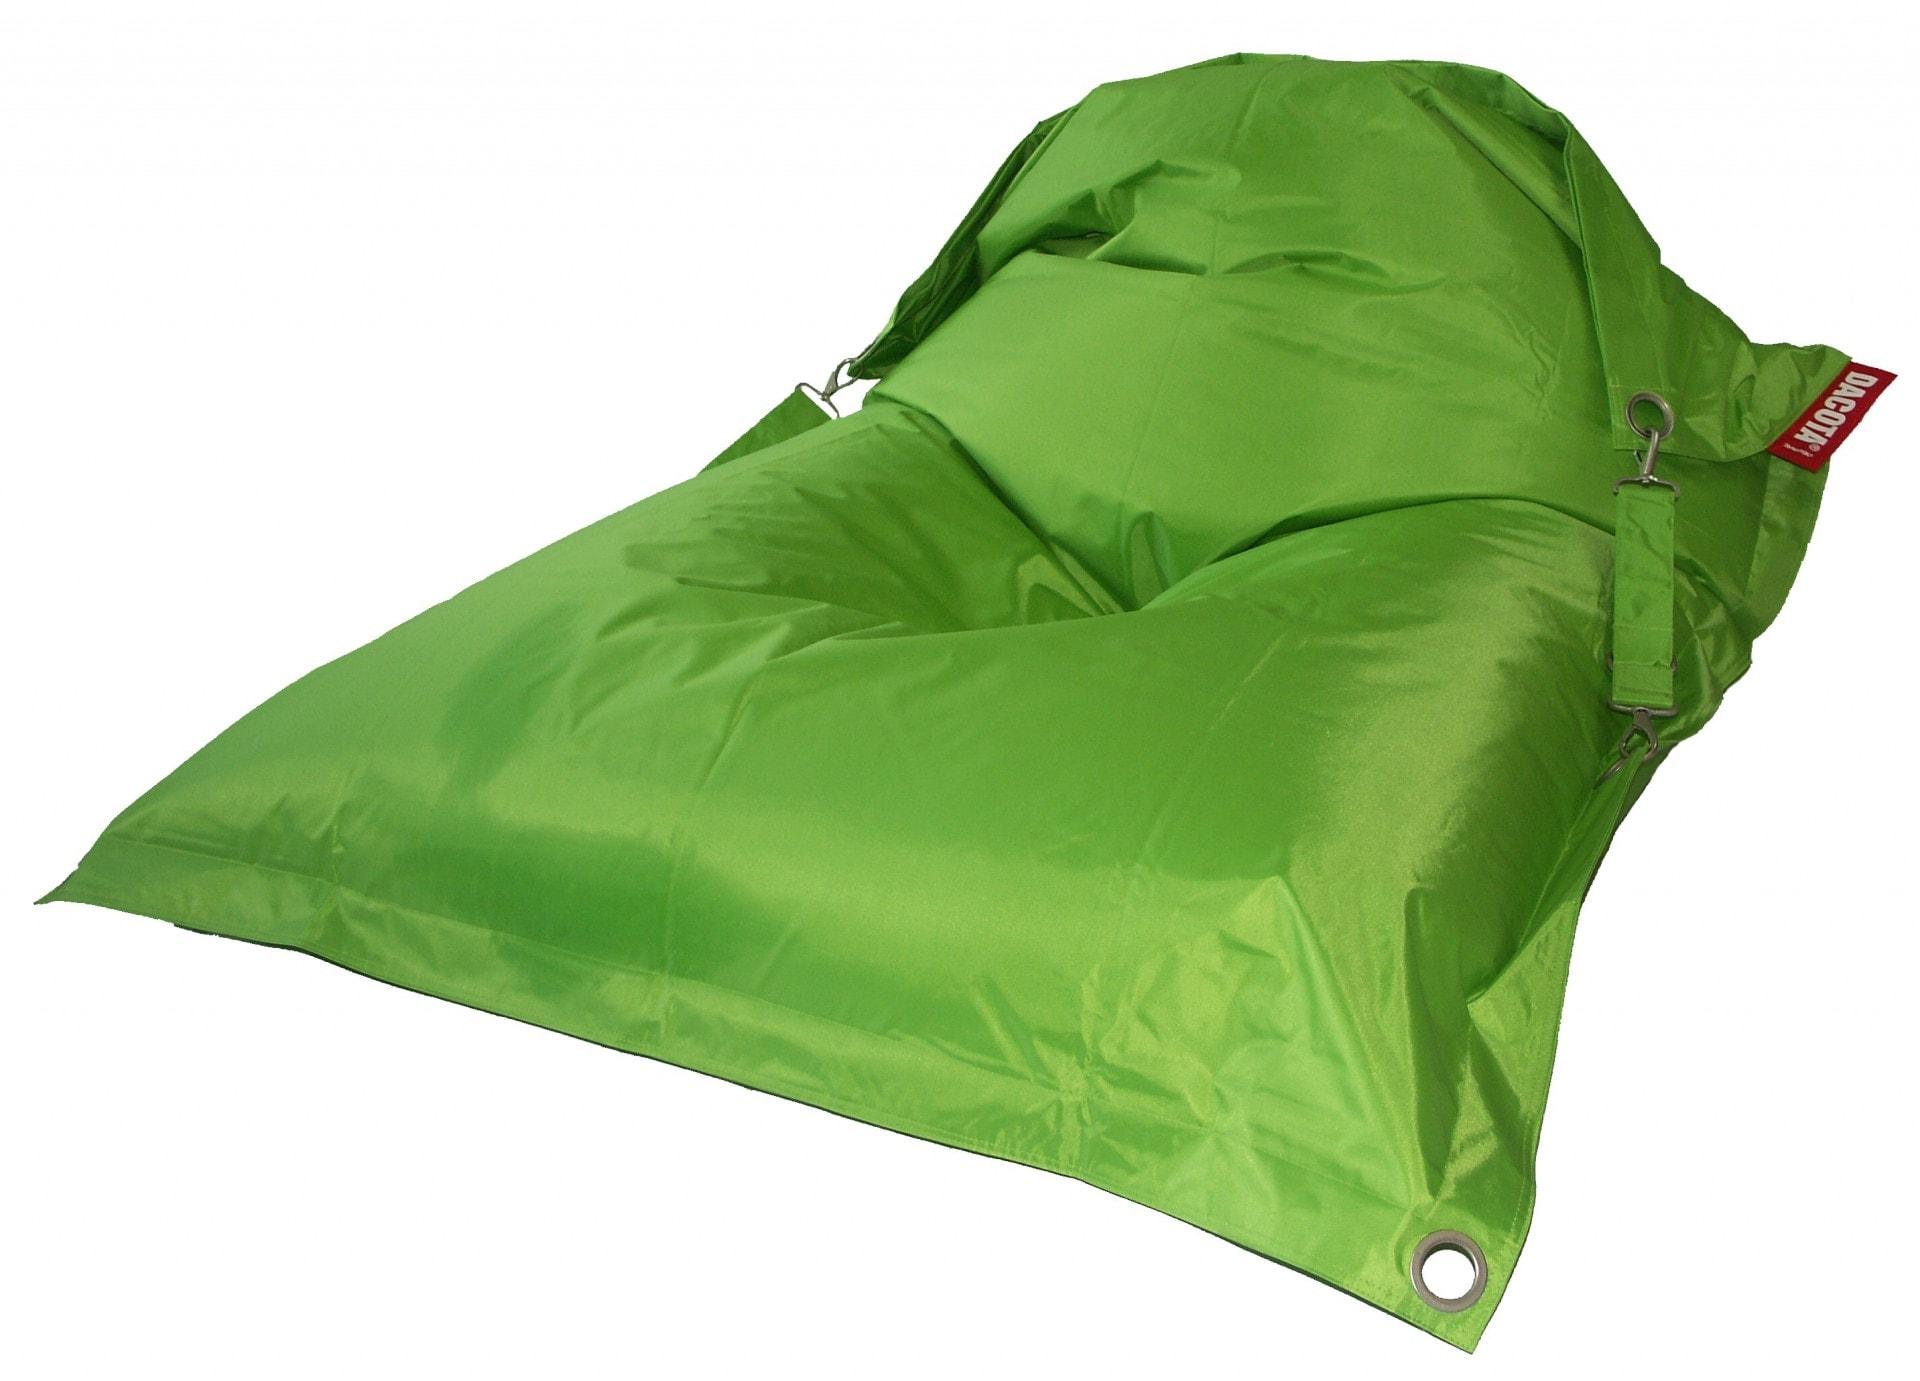 Sedací Vak Dacota Relax - zelený